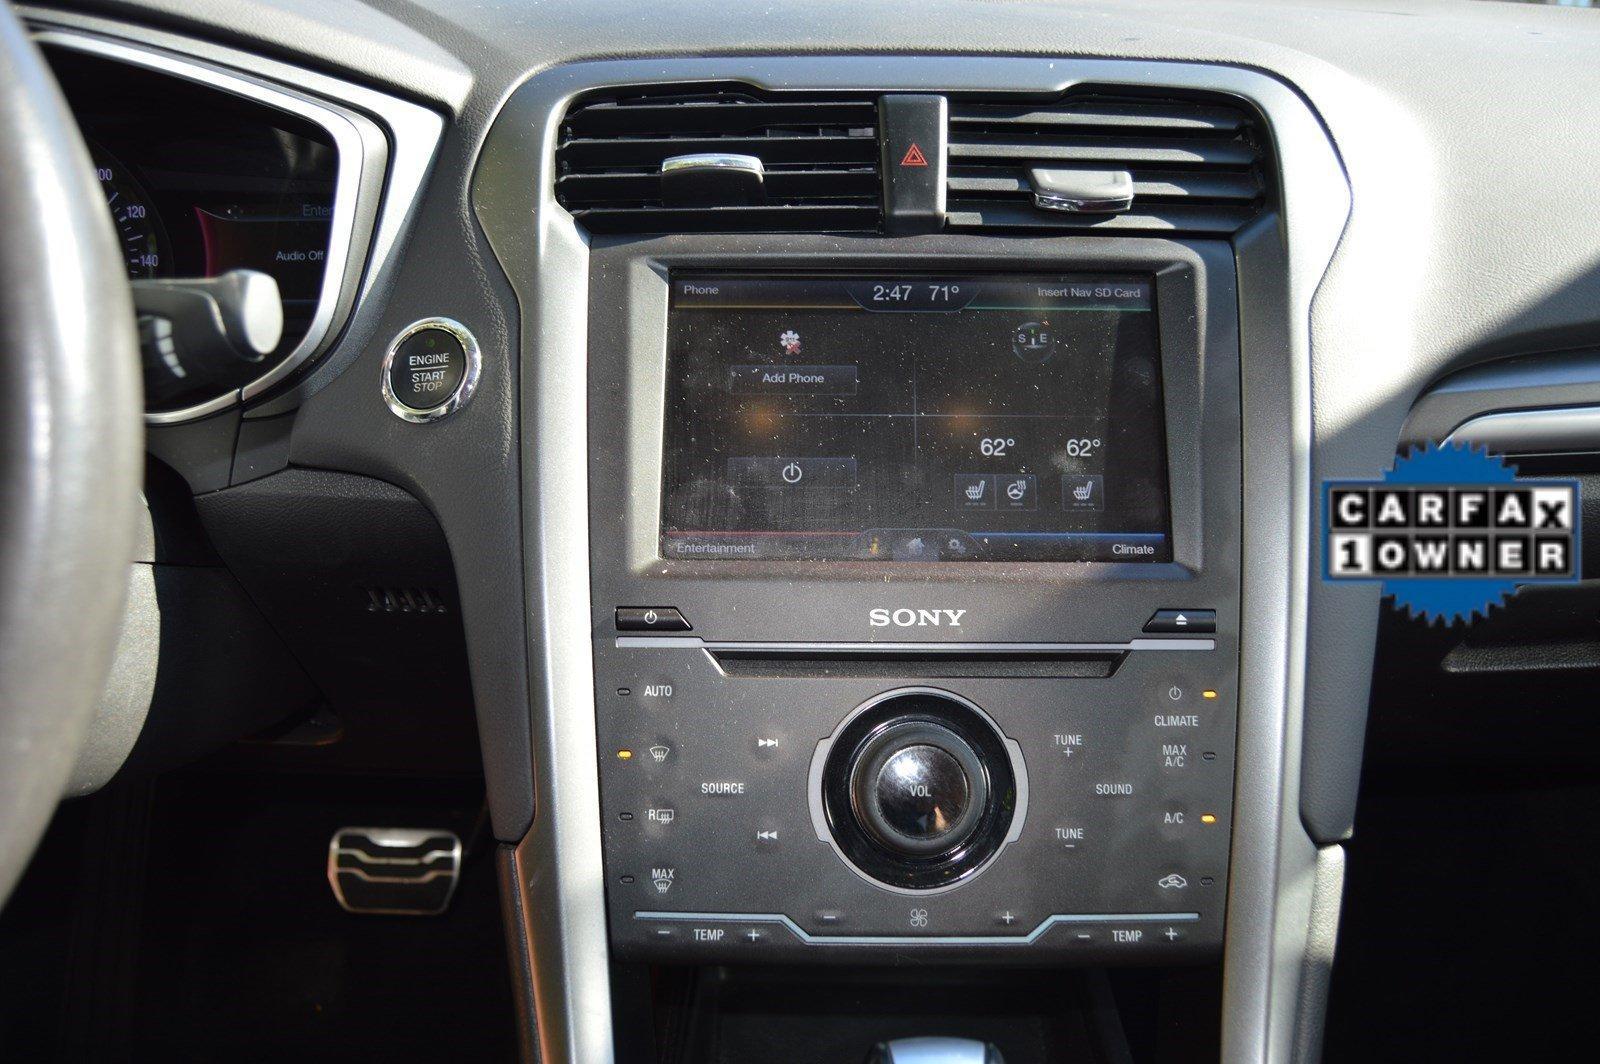 2015 Ford Fusion Titanium Limited Edition Red Interior